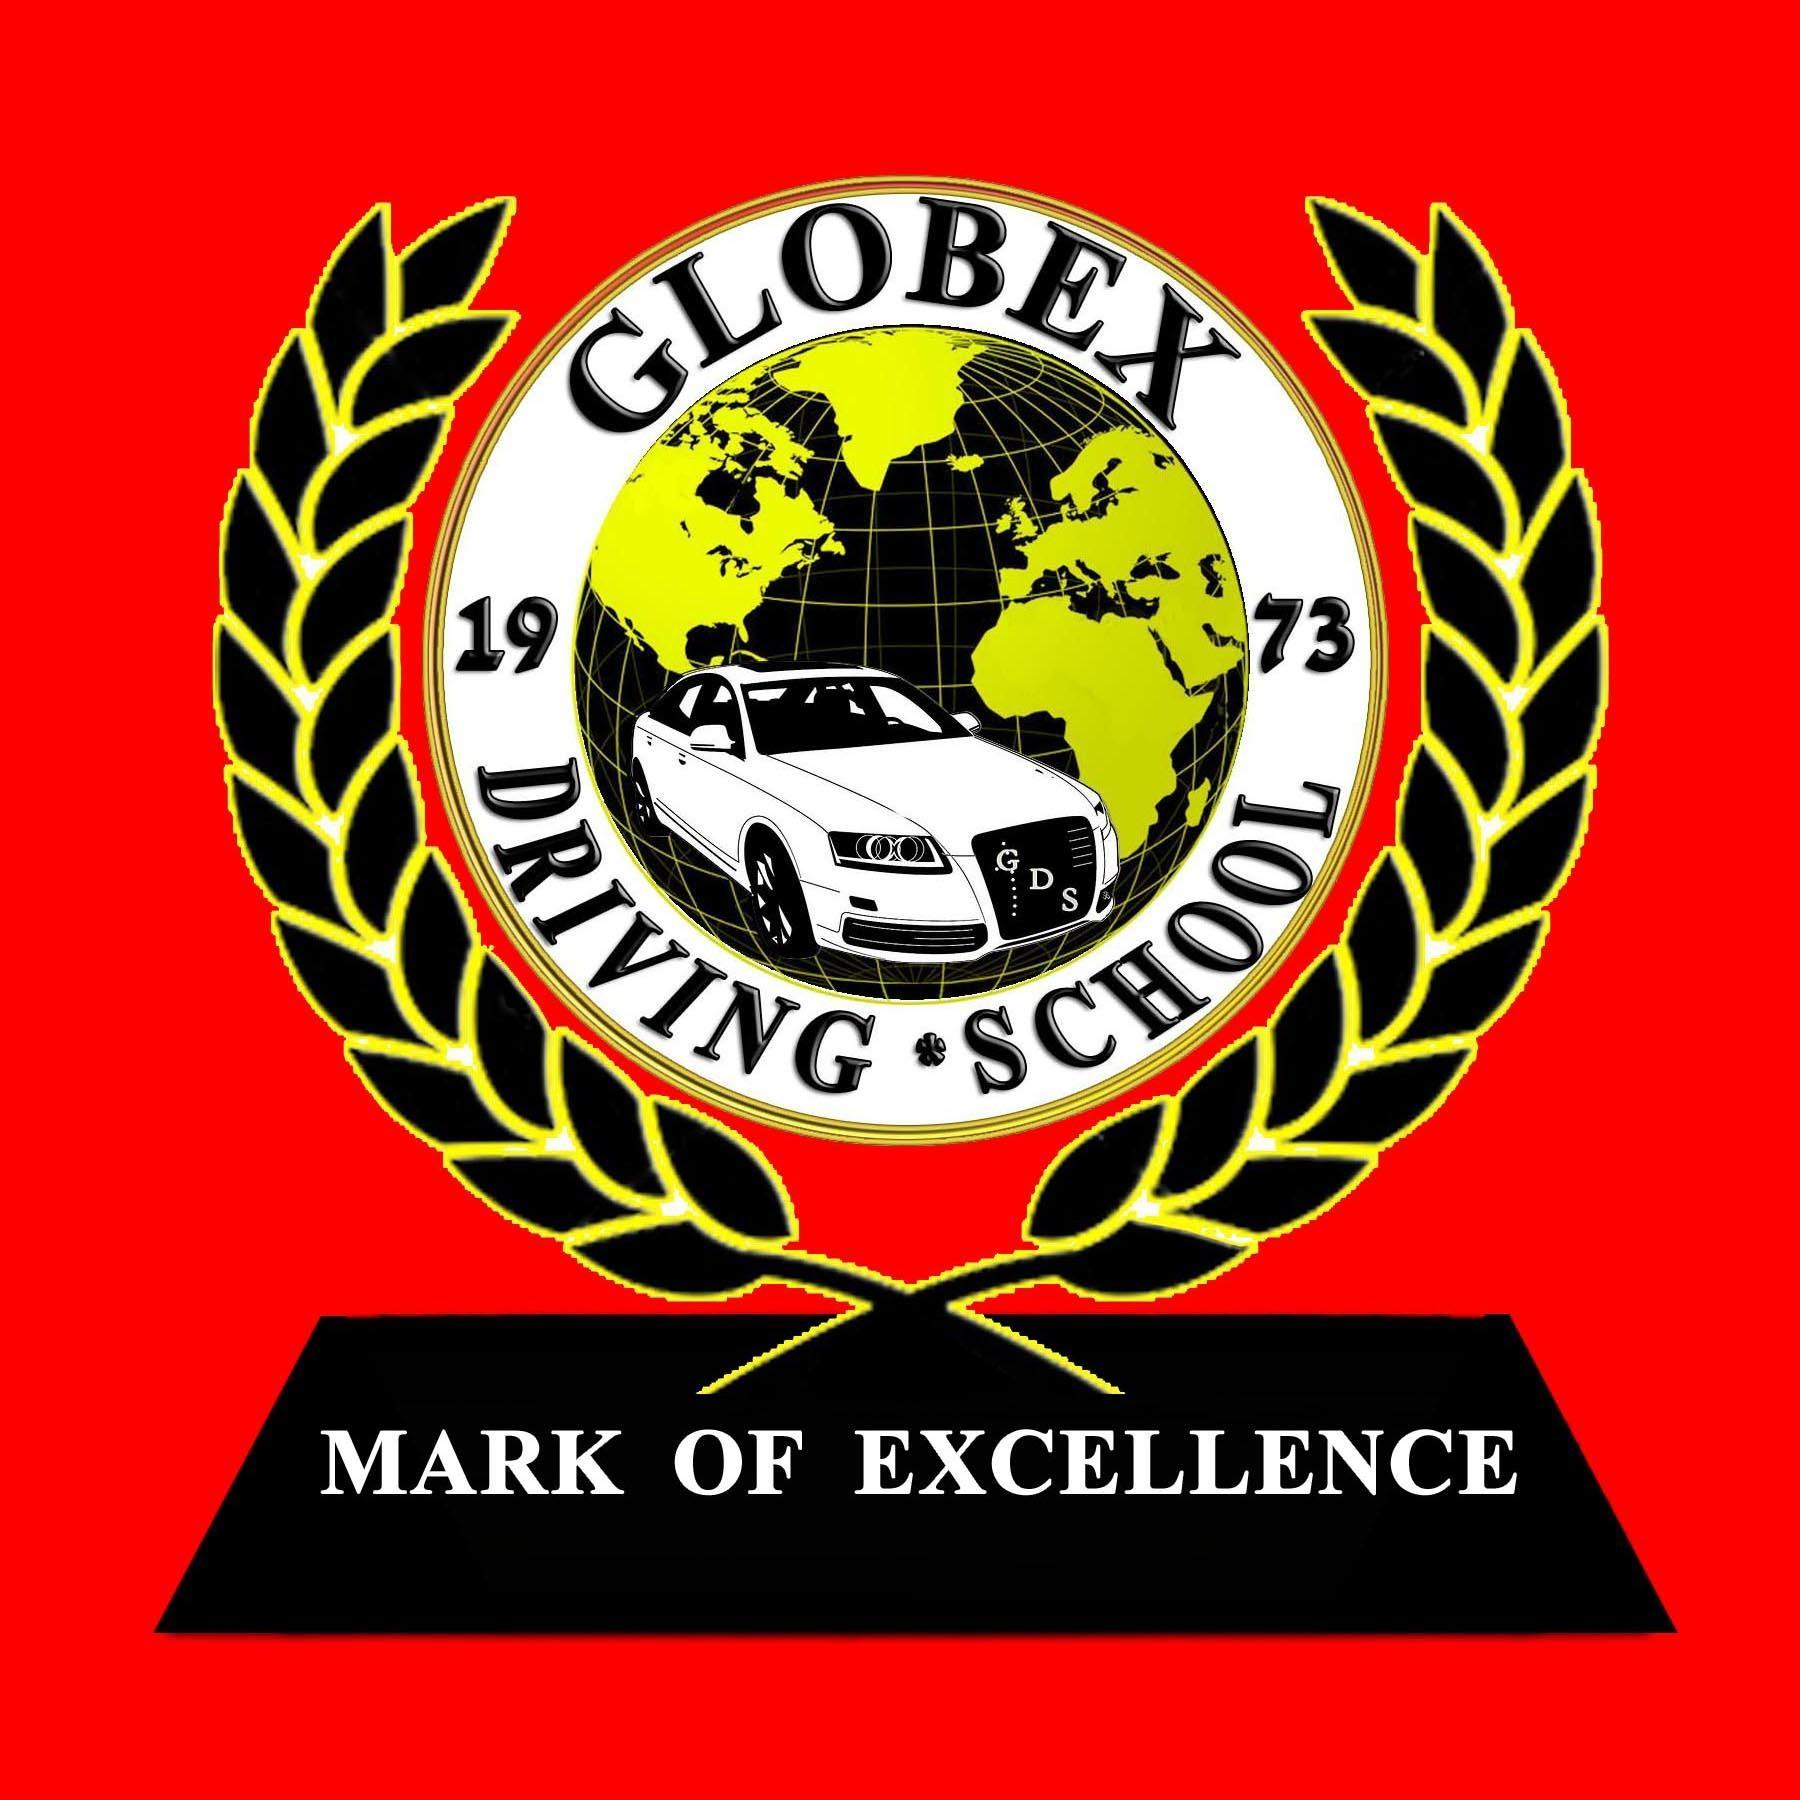 Globex Driving School Inc.